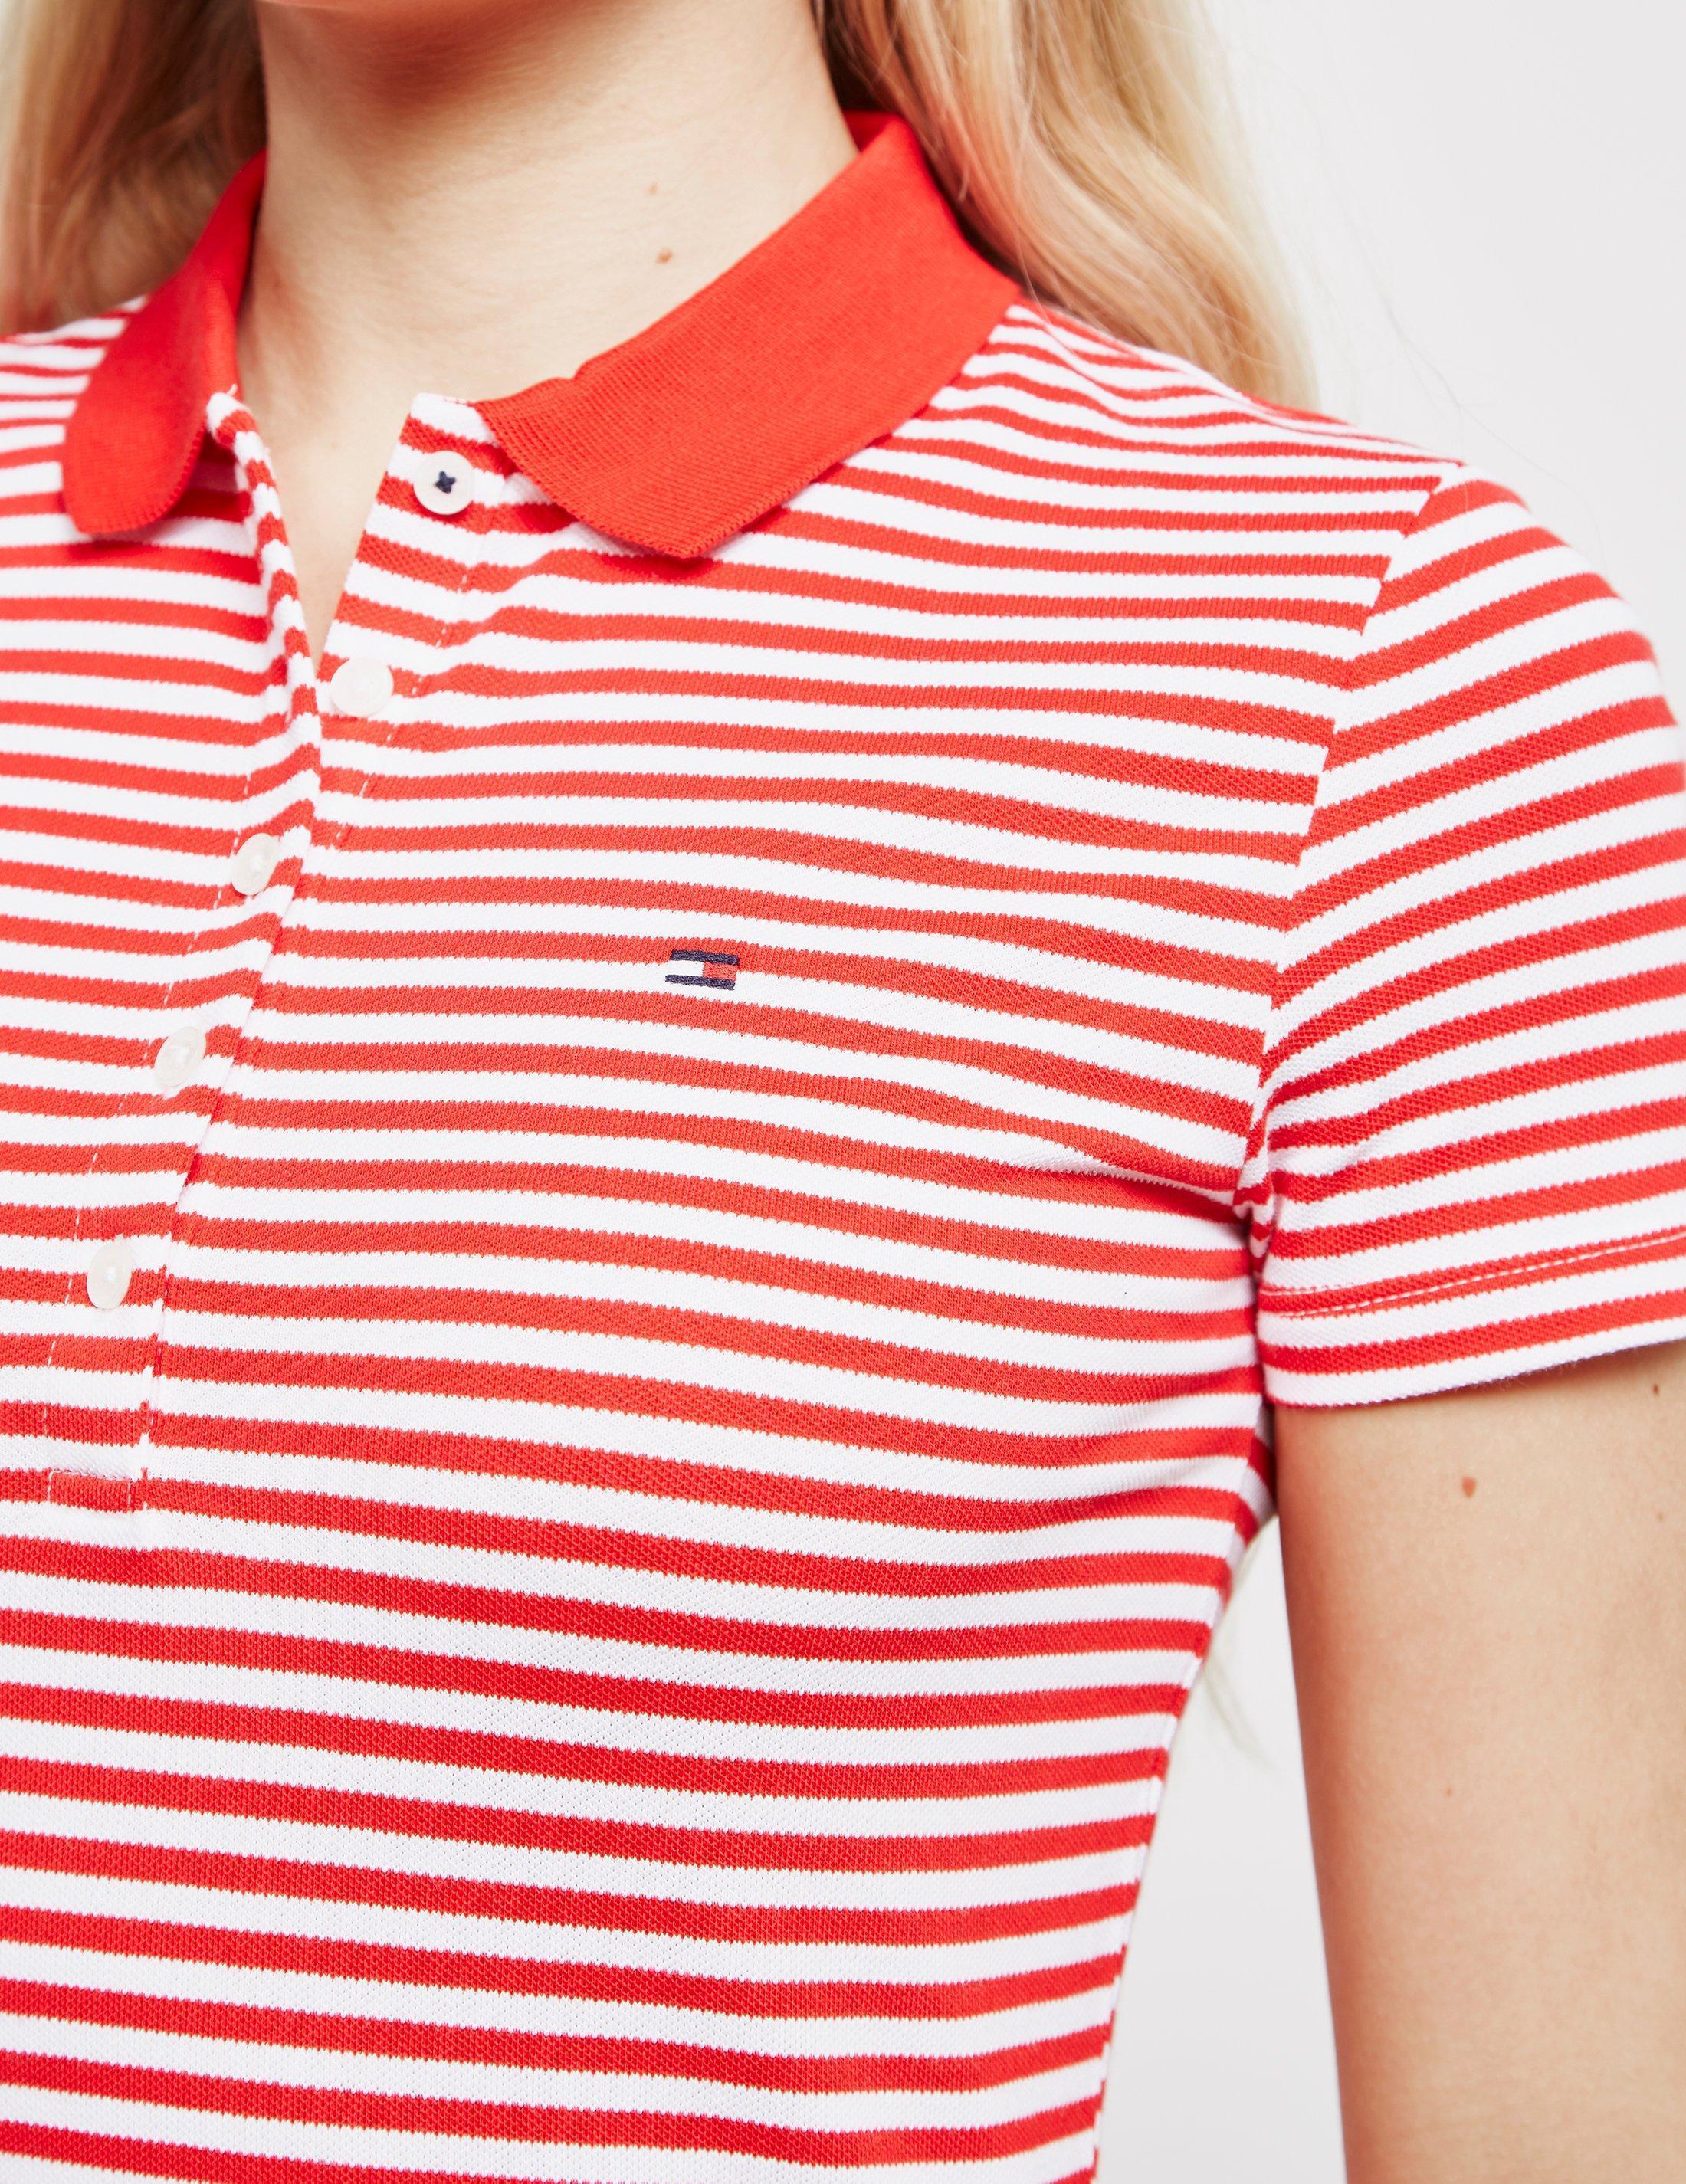 d078e0238a0 Tommy Hilfiger - Chiara Polo Shirt Dress Red - Lyst. View fullscreen